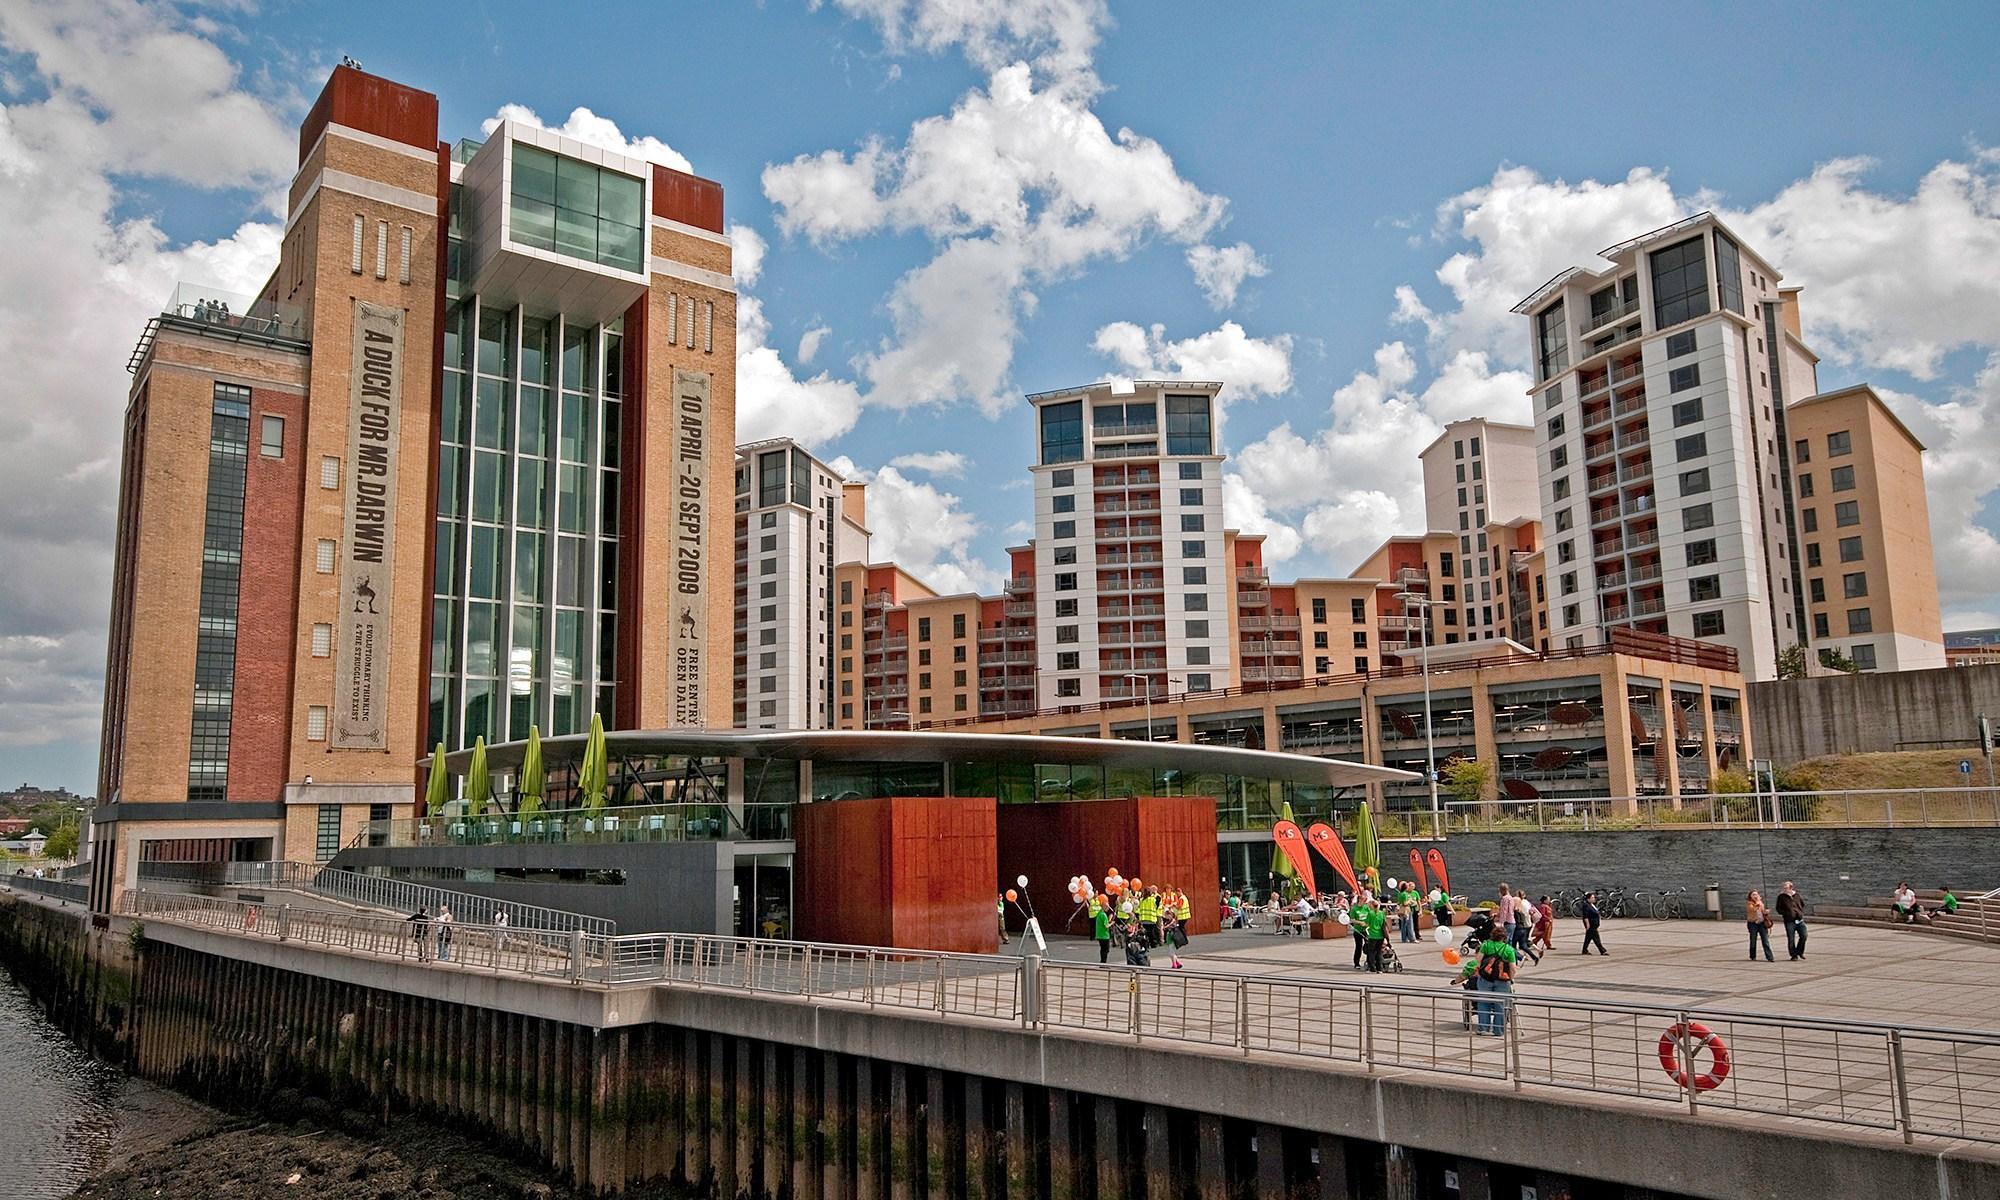 Baltic Centre for Contemporary Art, Newcastle